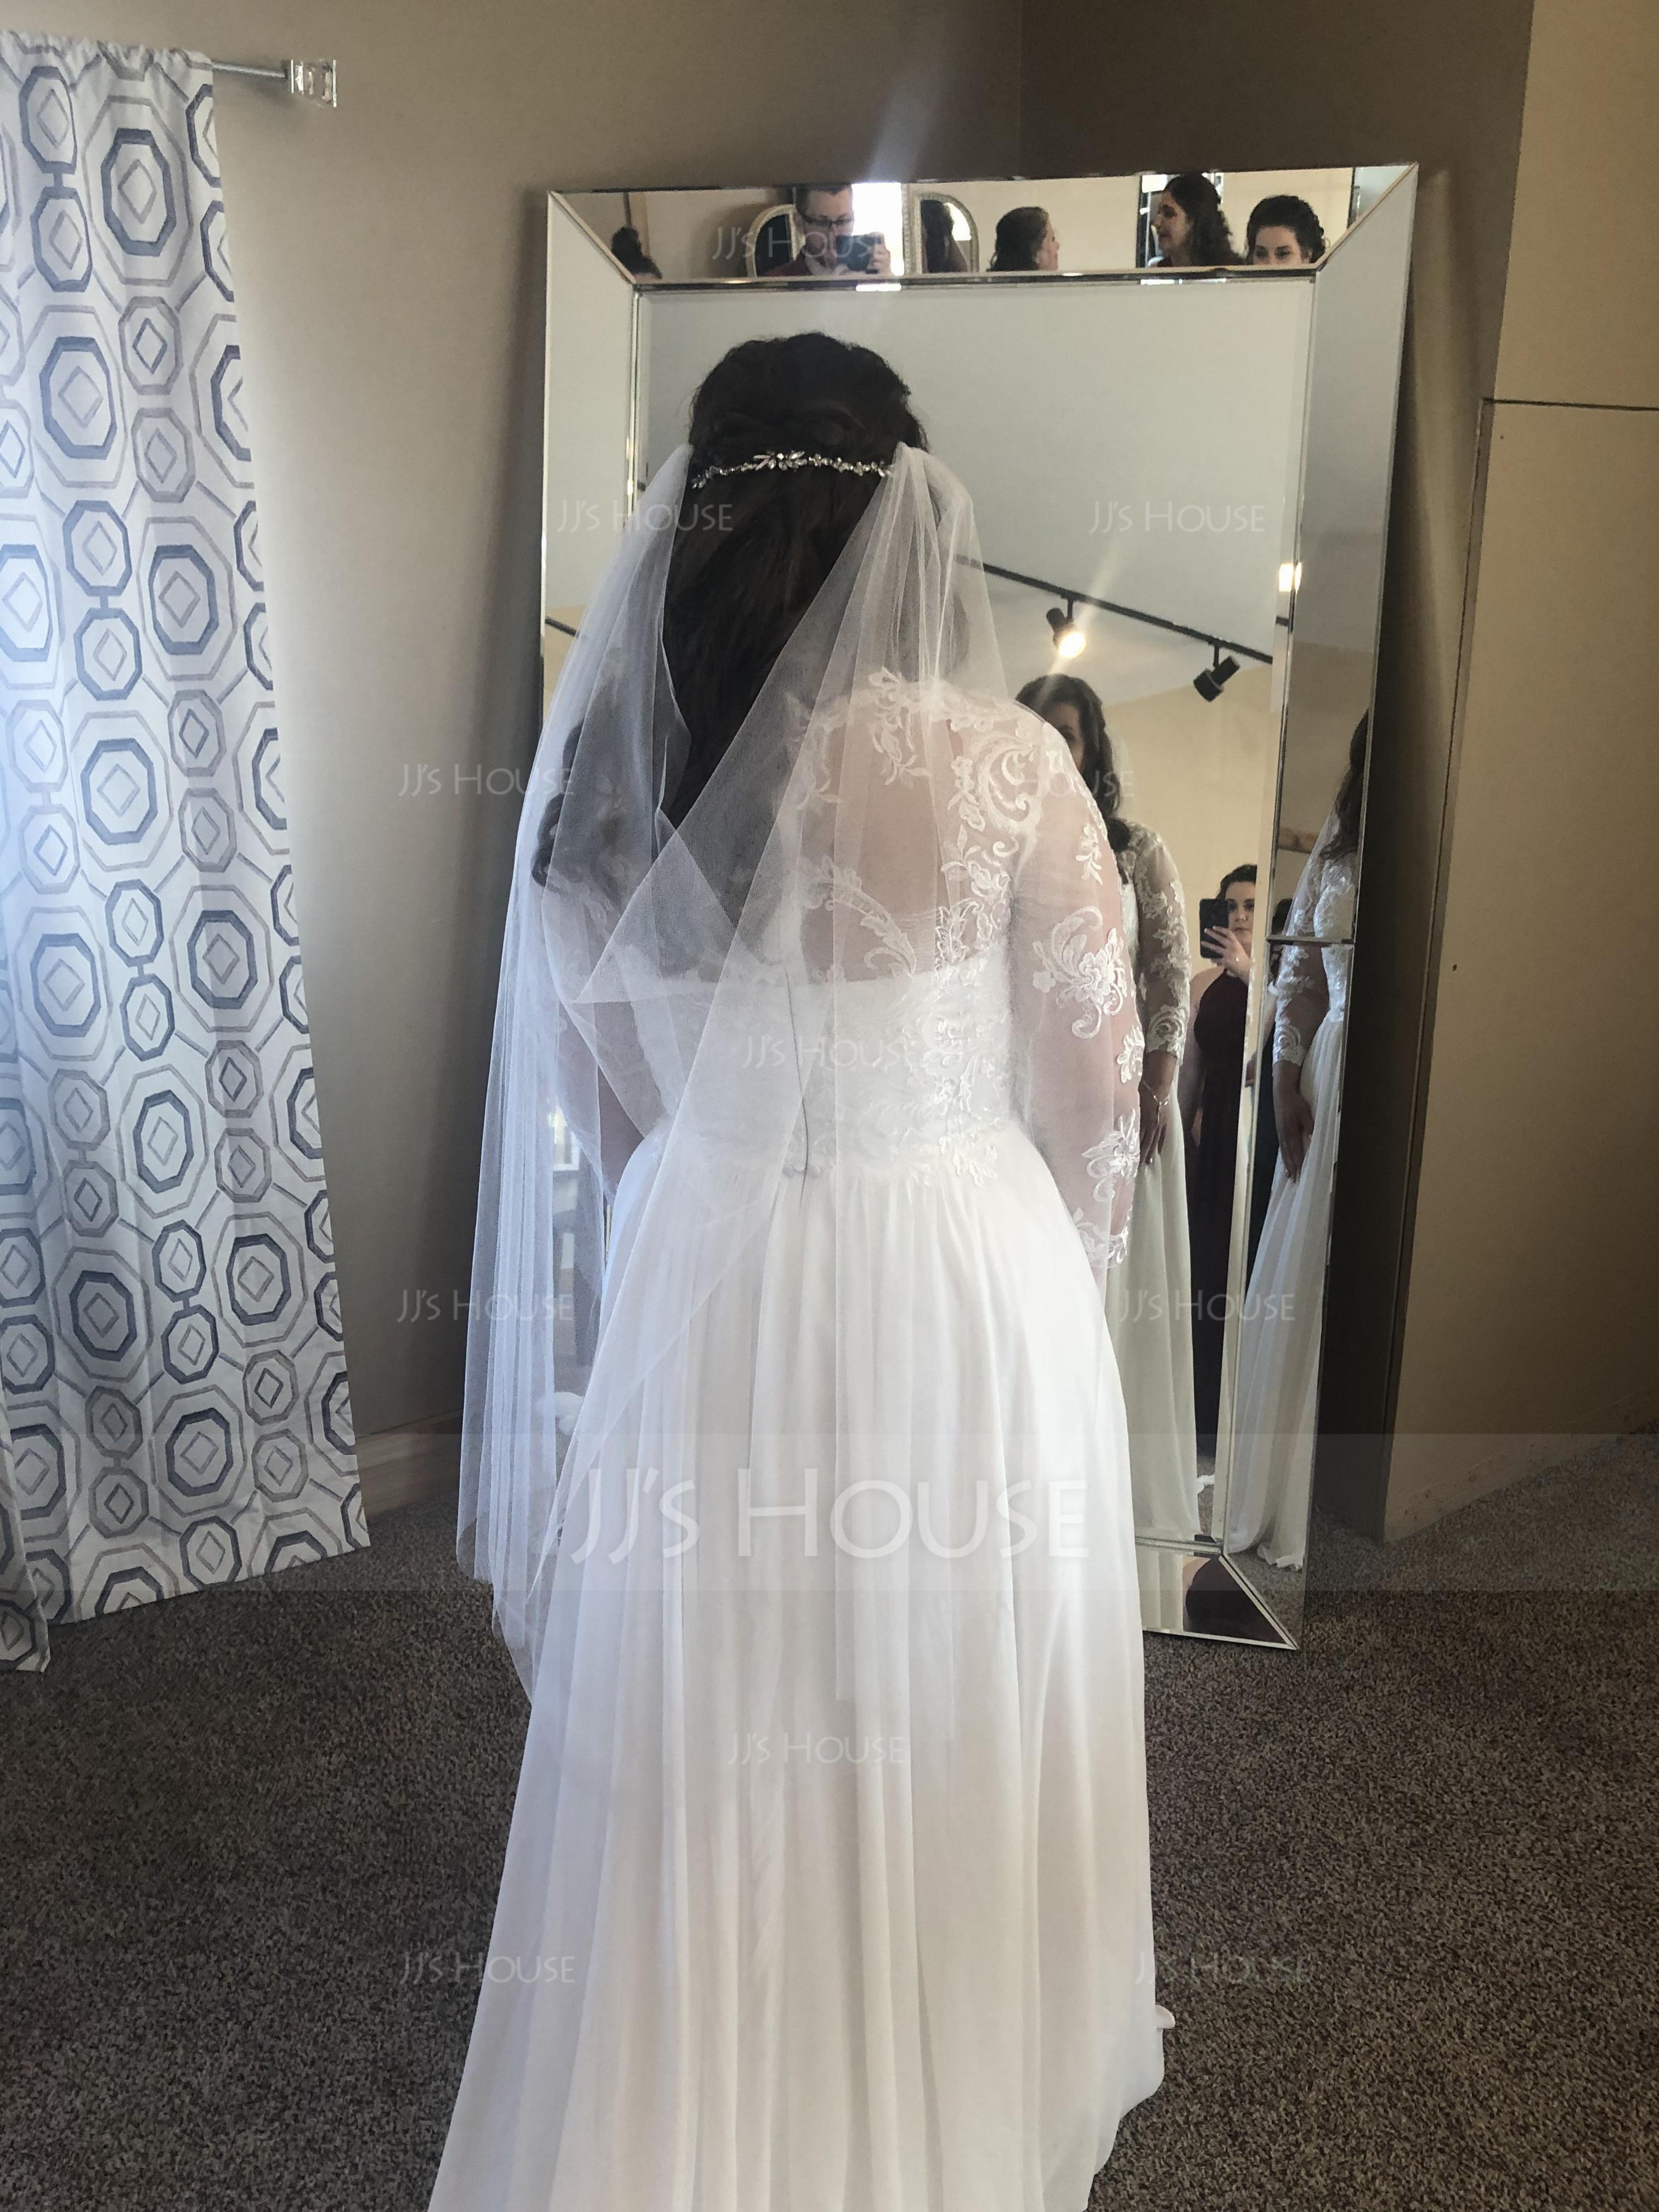 A-Line/Princess V-neck Sweep Train Chiffon Lace Wedding Dress With Beading Sequins (002134553)